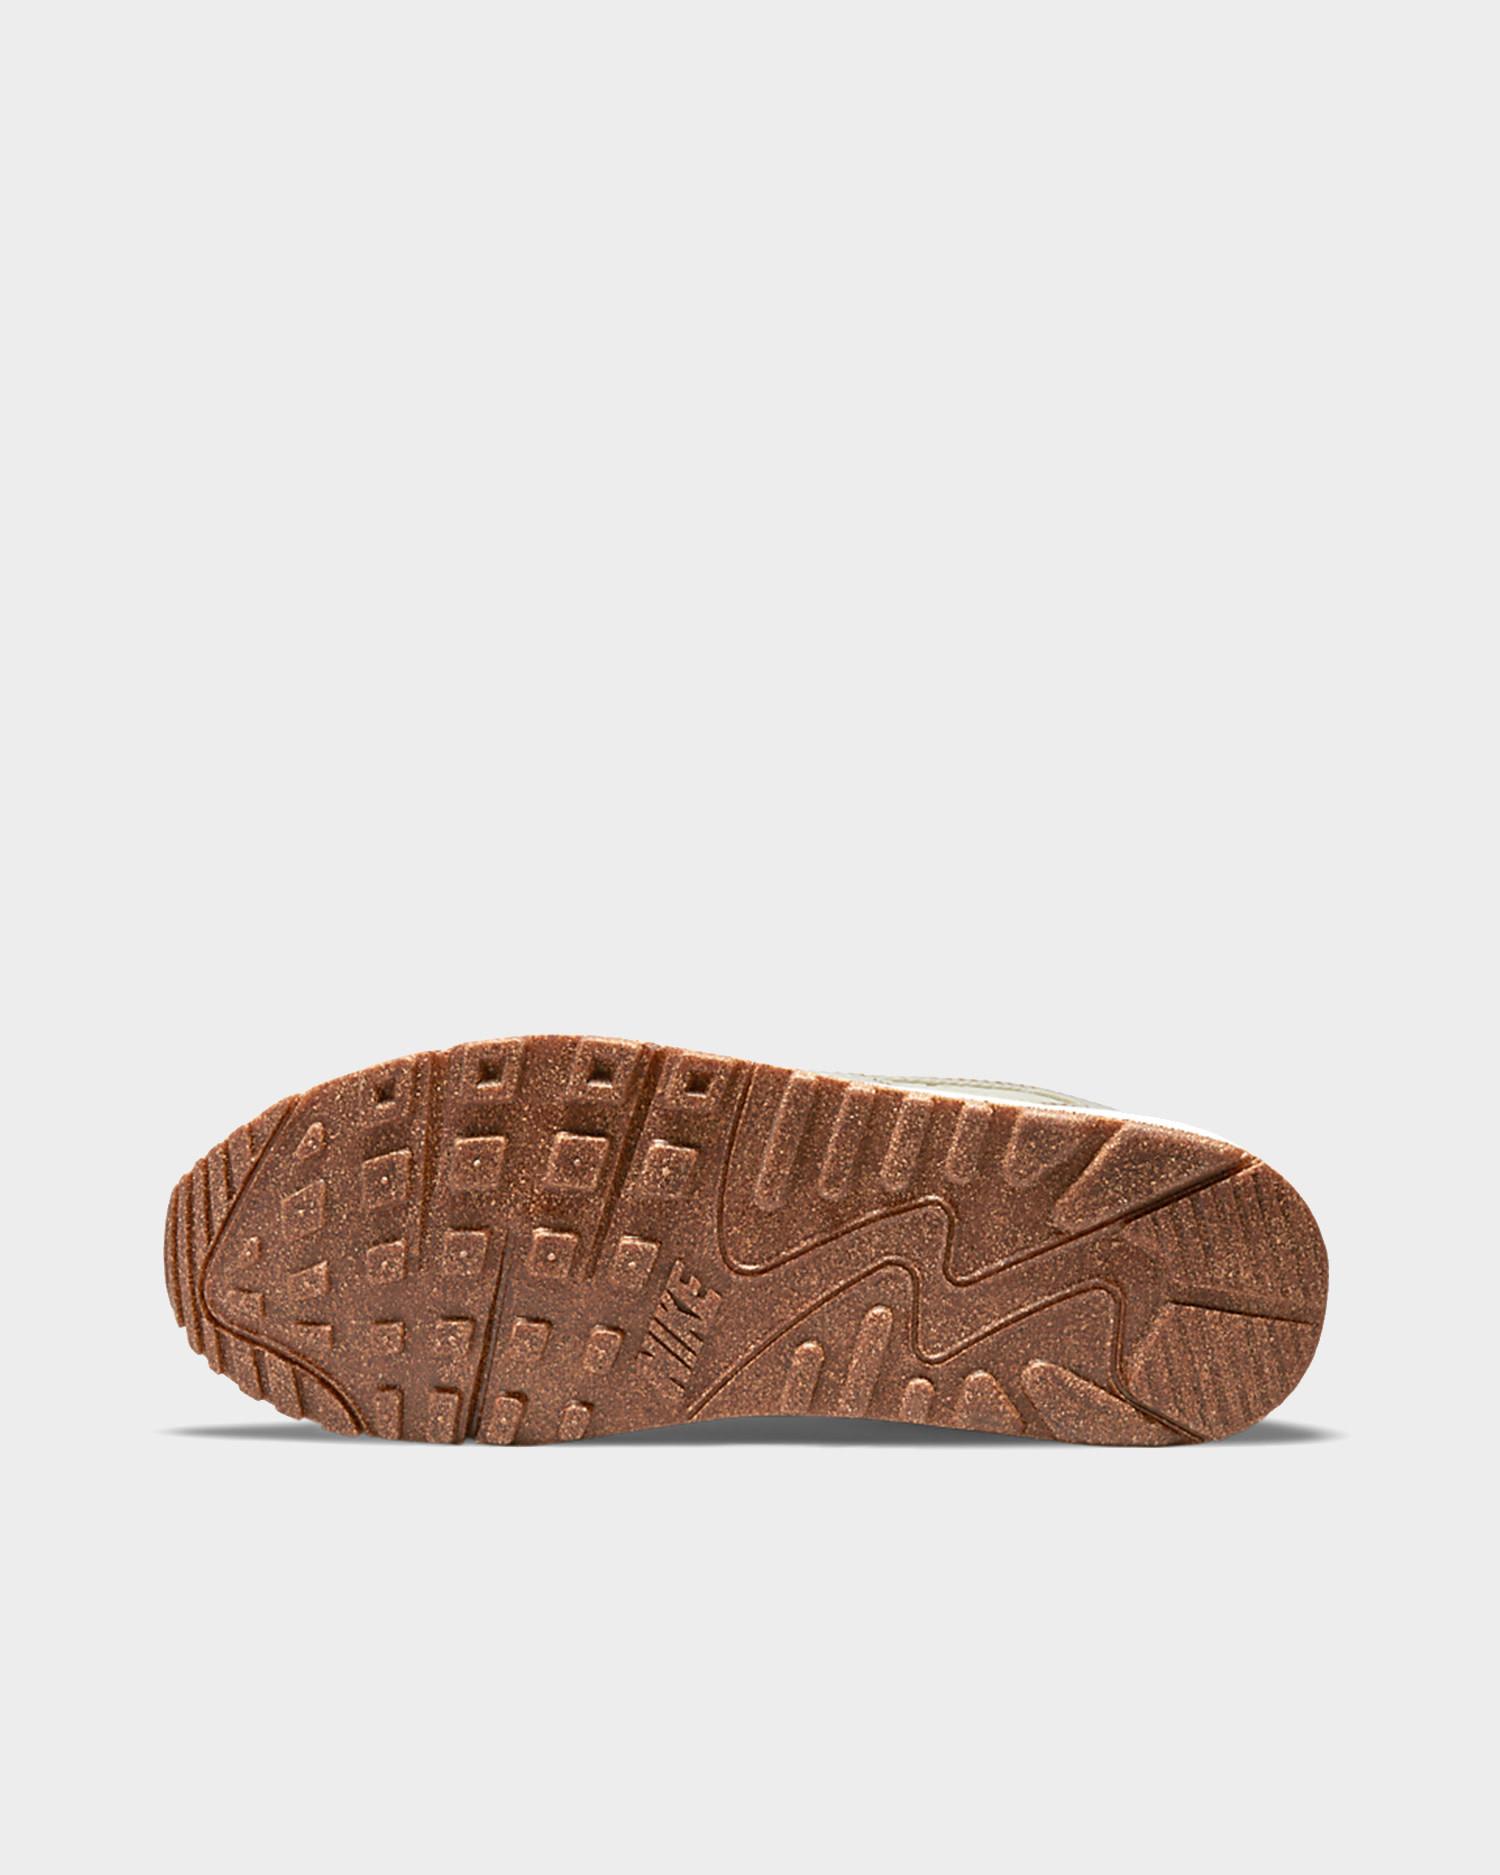 Nike air max 90 se Coconut milk/wheat-obsidian-white